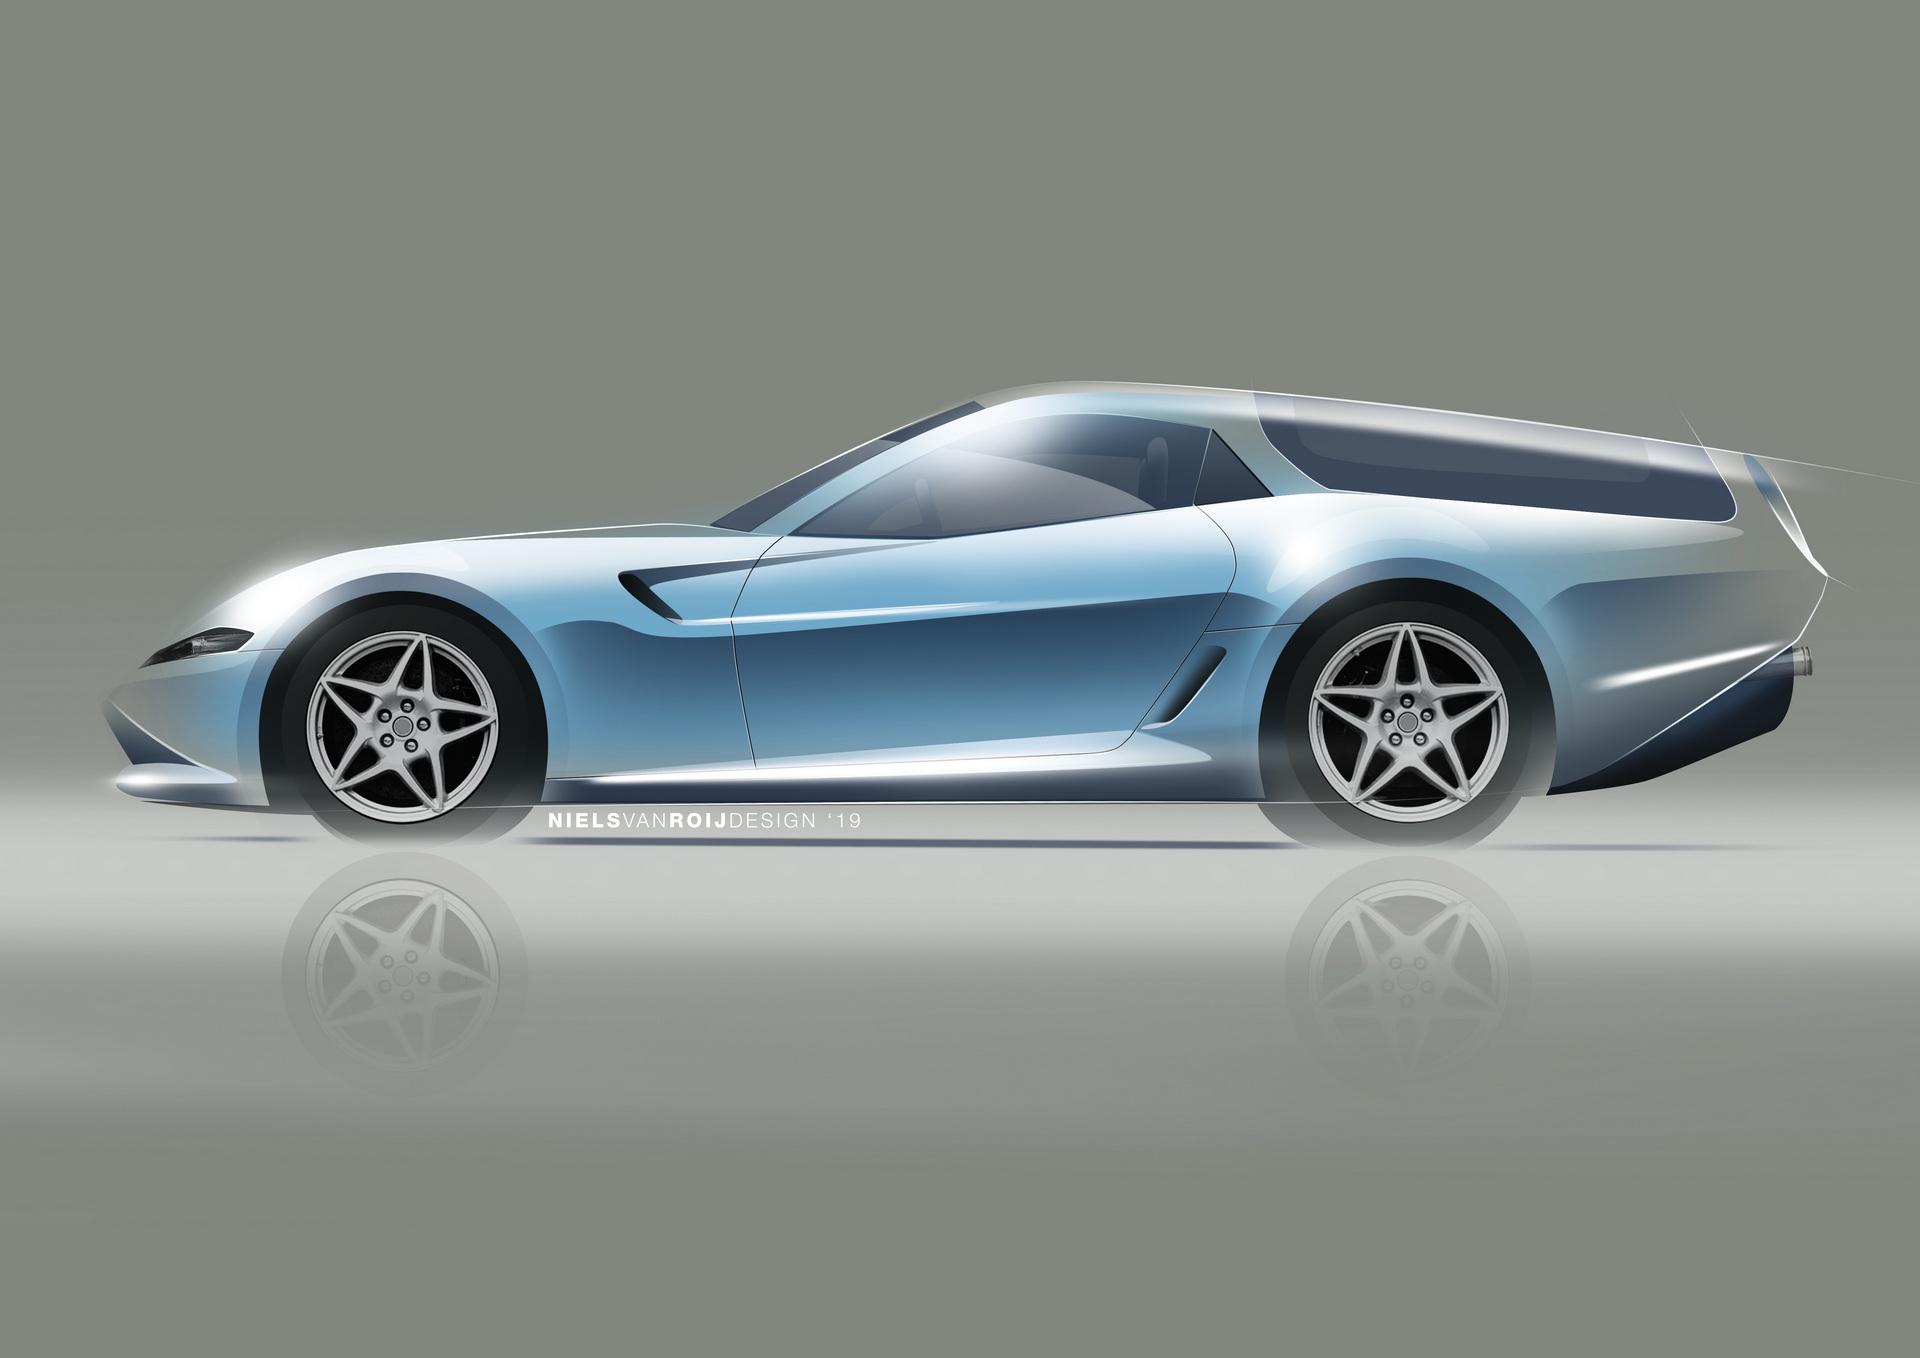 Ferrari-Daytona-Shooting-Brake-Hommage-by-Niels-van-Roij-Design-22